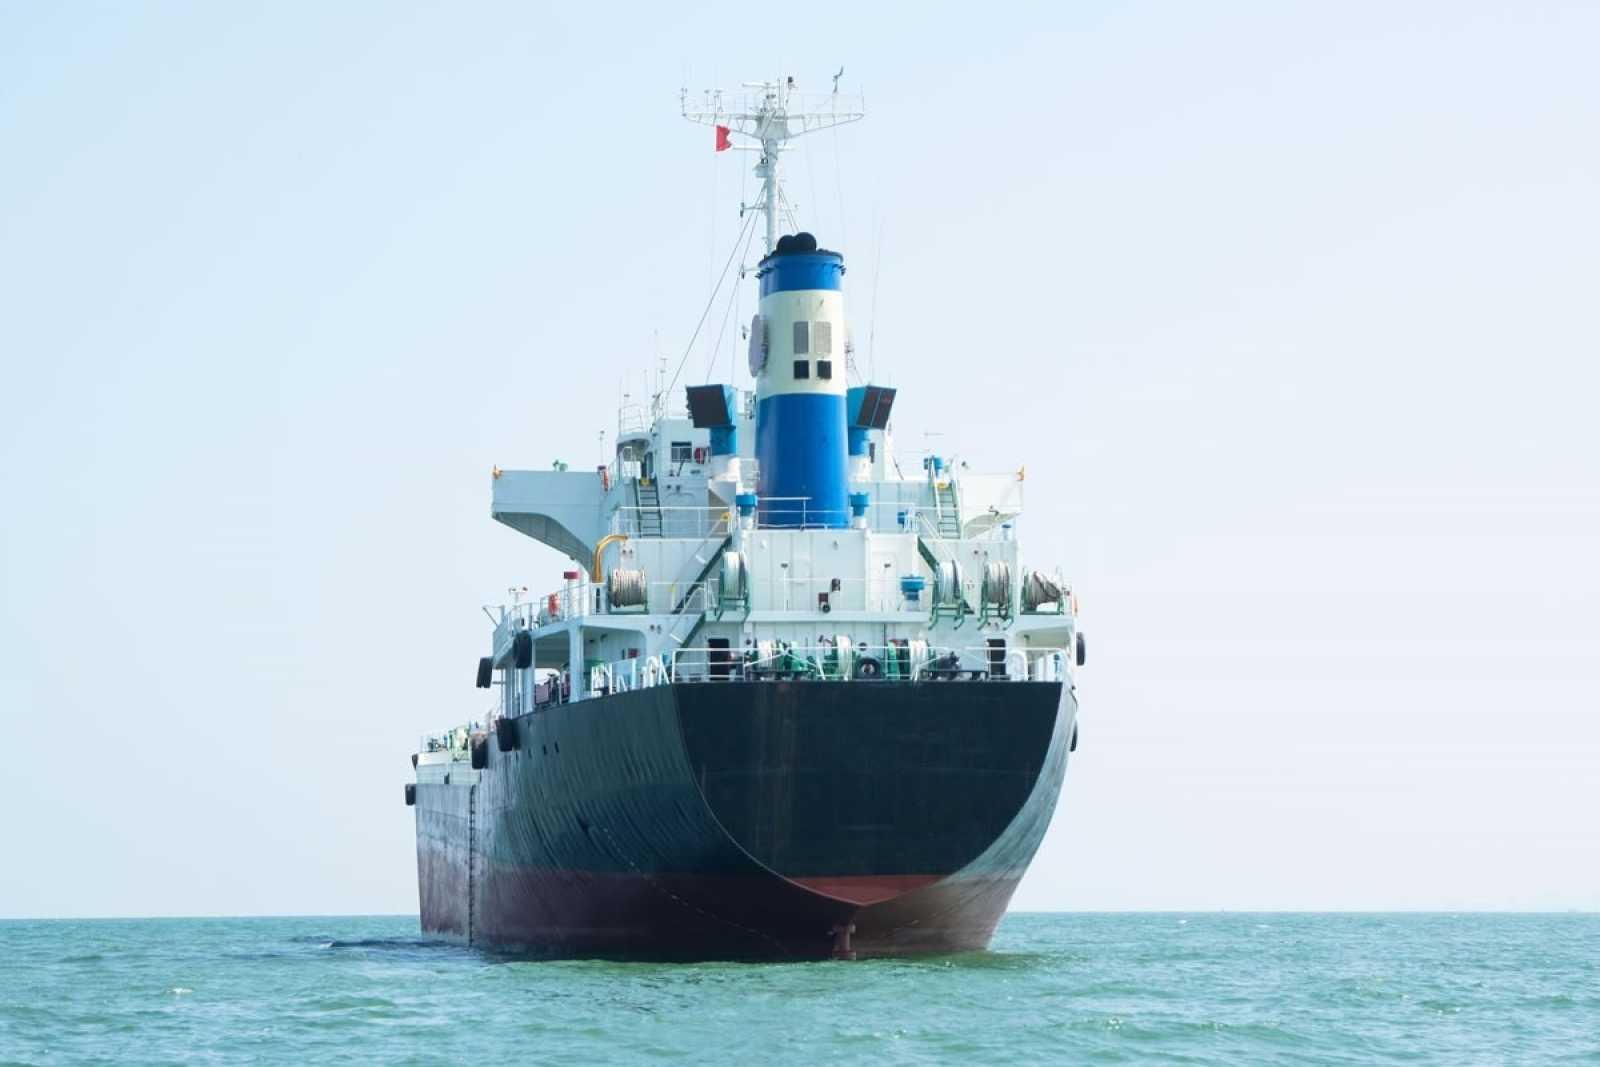 Ship_blue